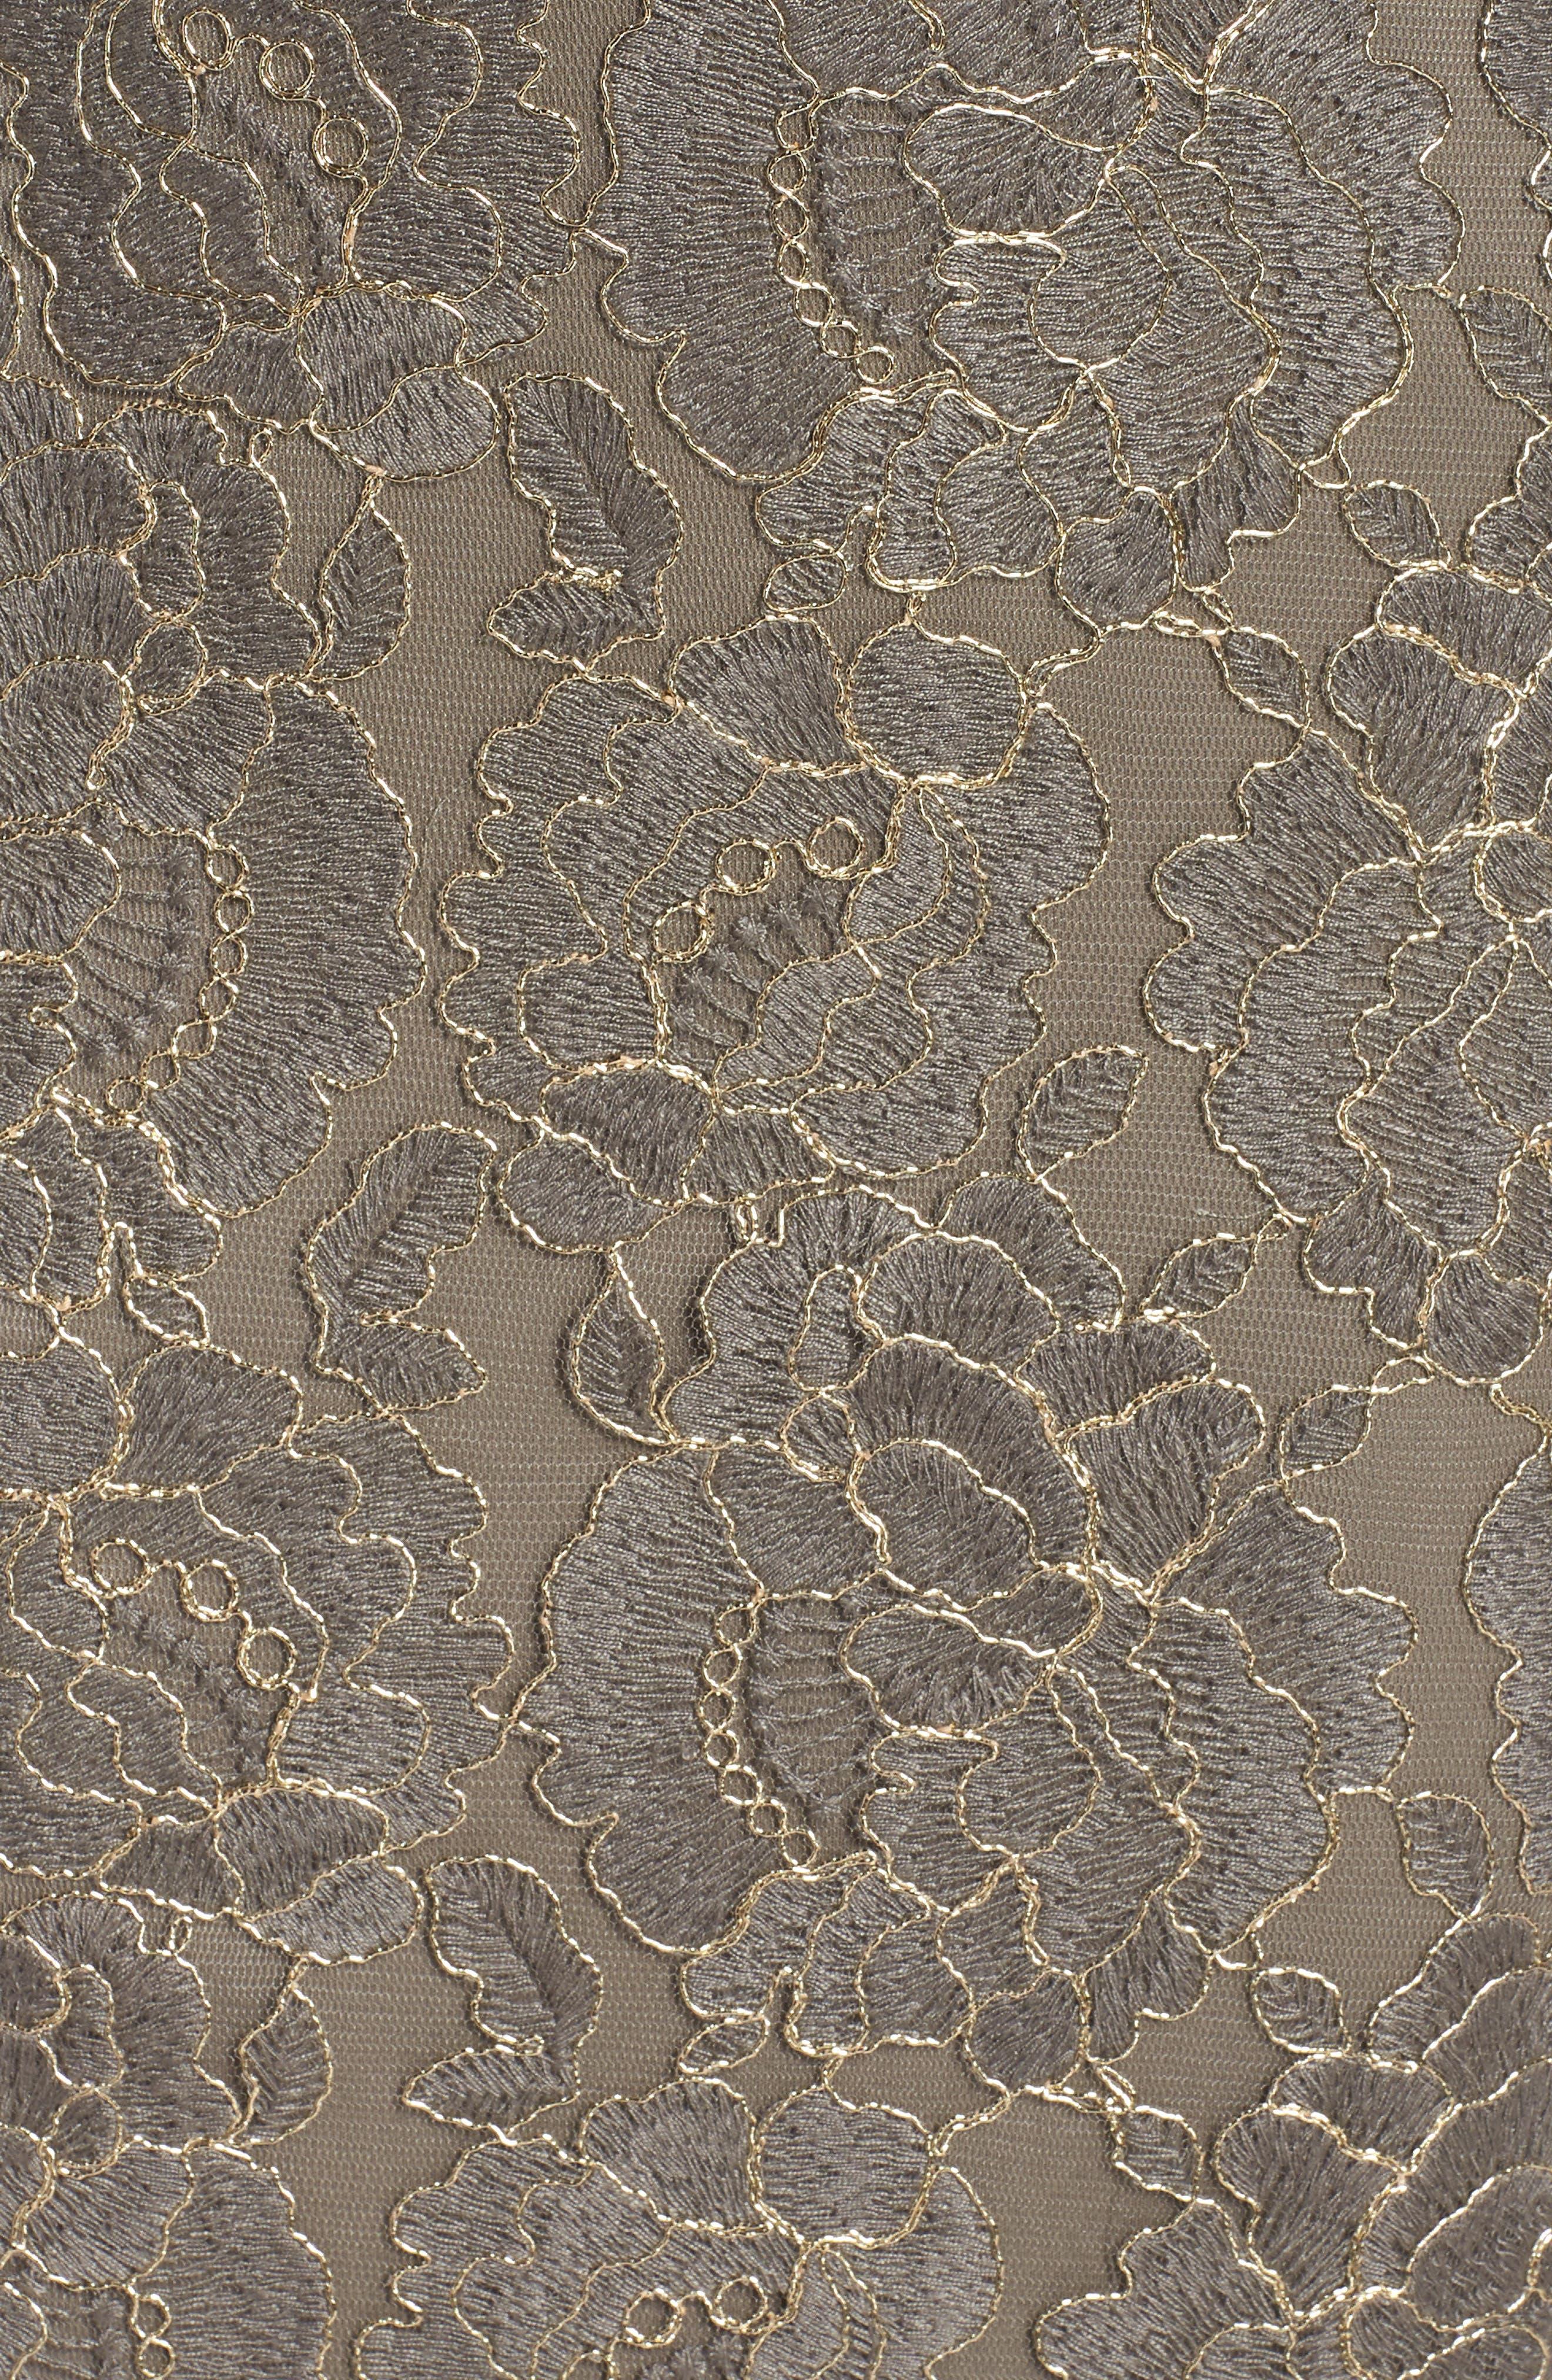 Lace Sheath Dress,                             Alternate thumbnail 6, color,                             020